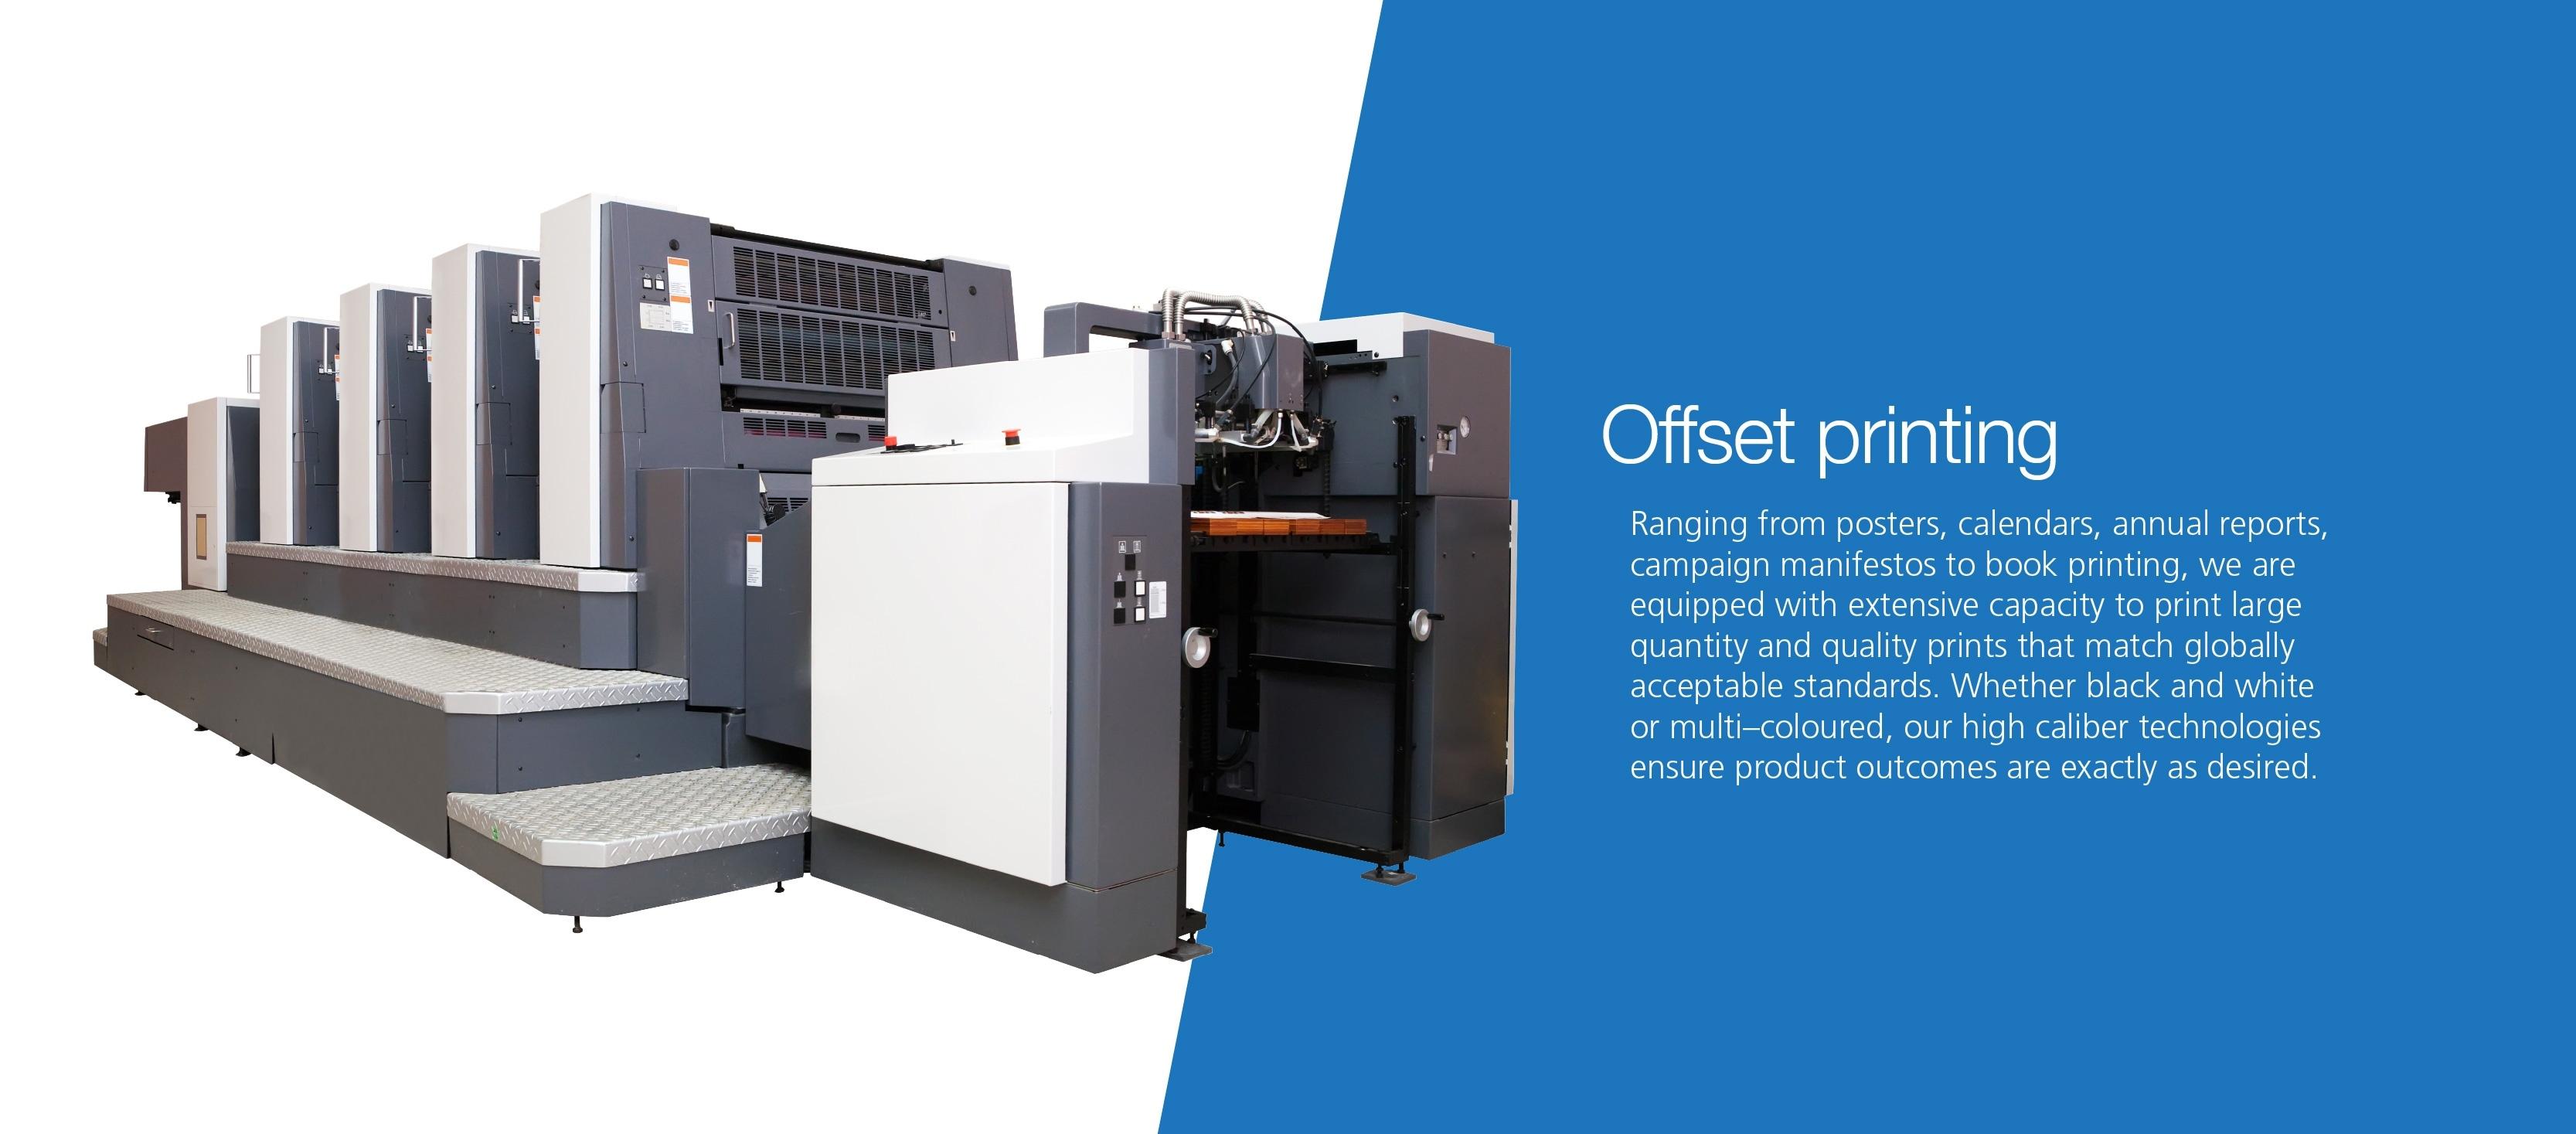 Offset Printing - Nairobi | Brandworld Communications Ltd_Calendar Printing In Kenya